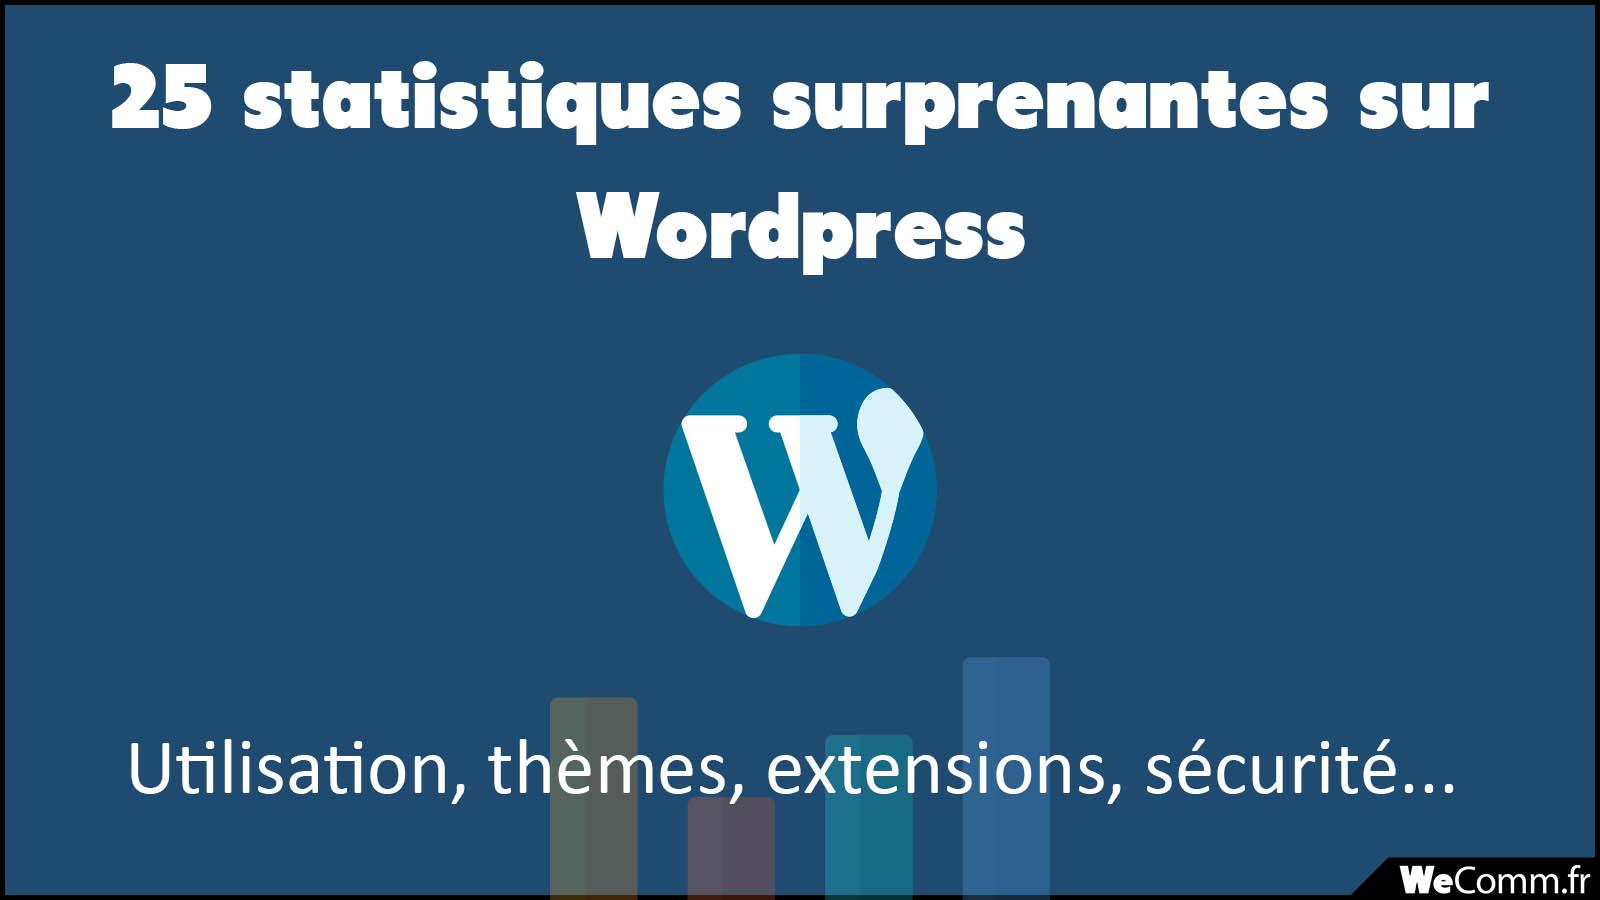 Statistiques sur WordPress